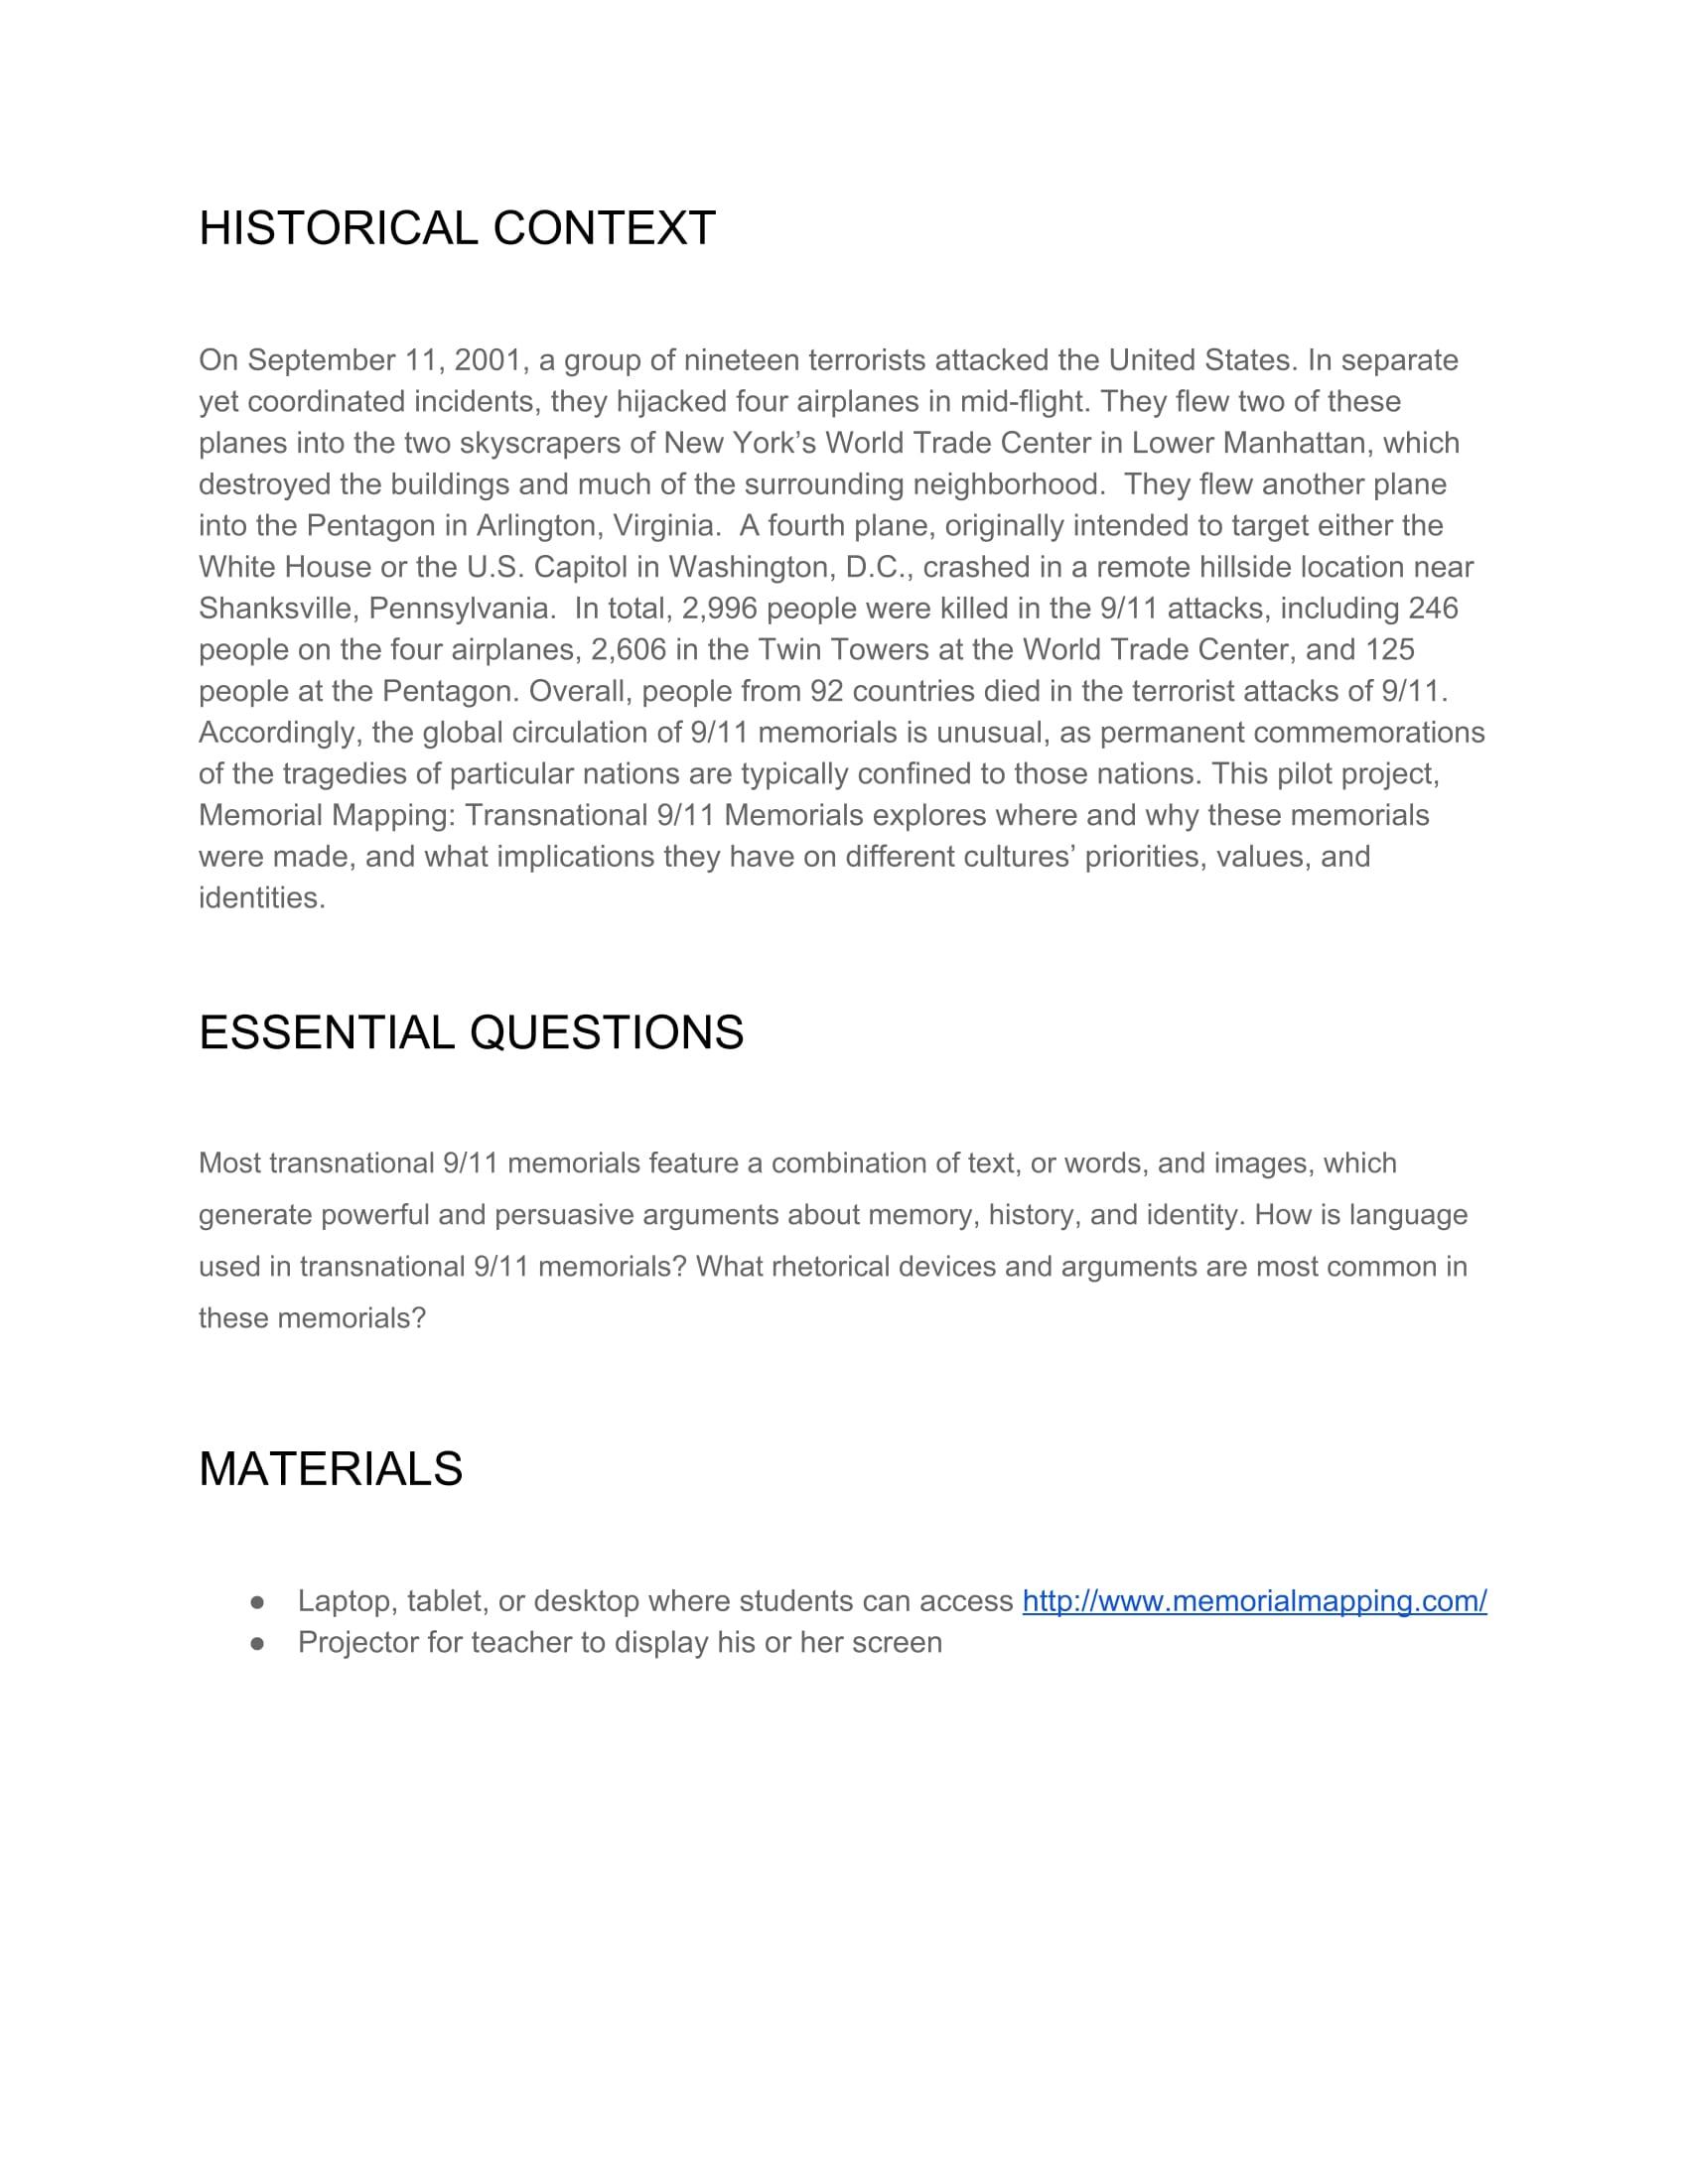 English Lesson Plan Final-3.jpg